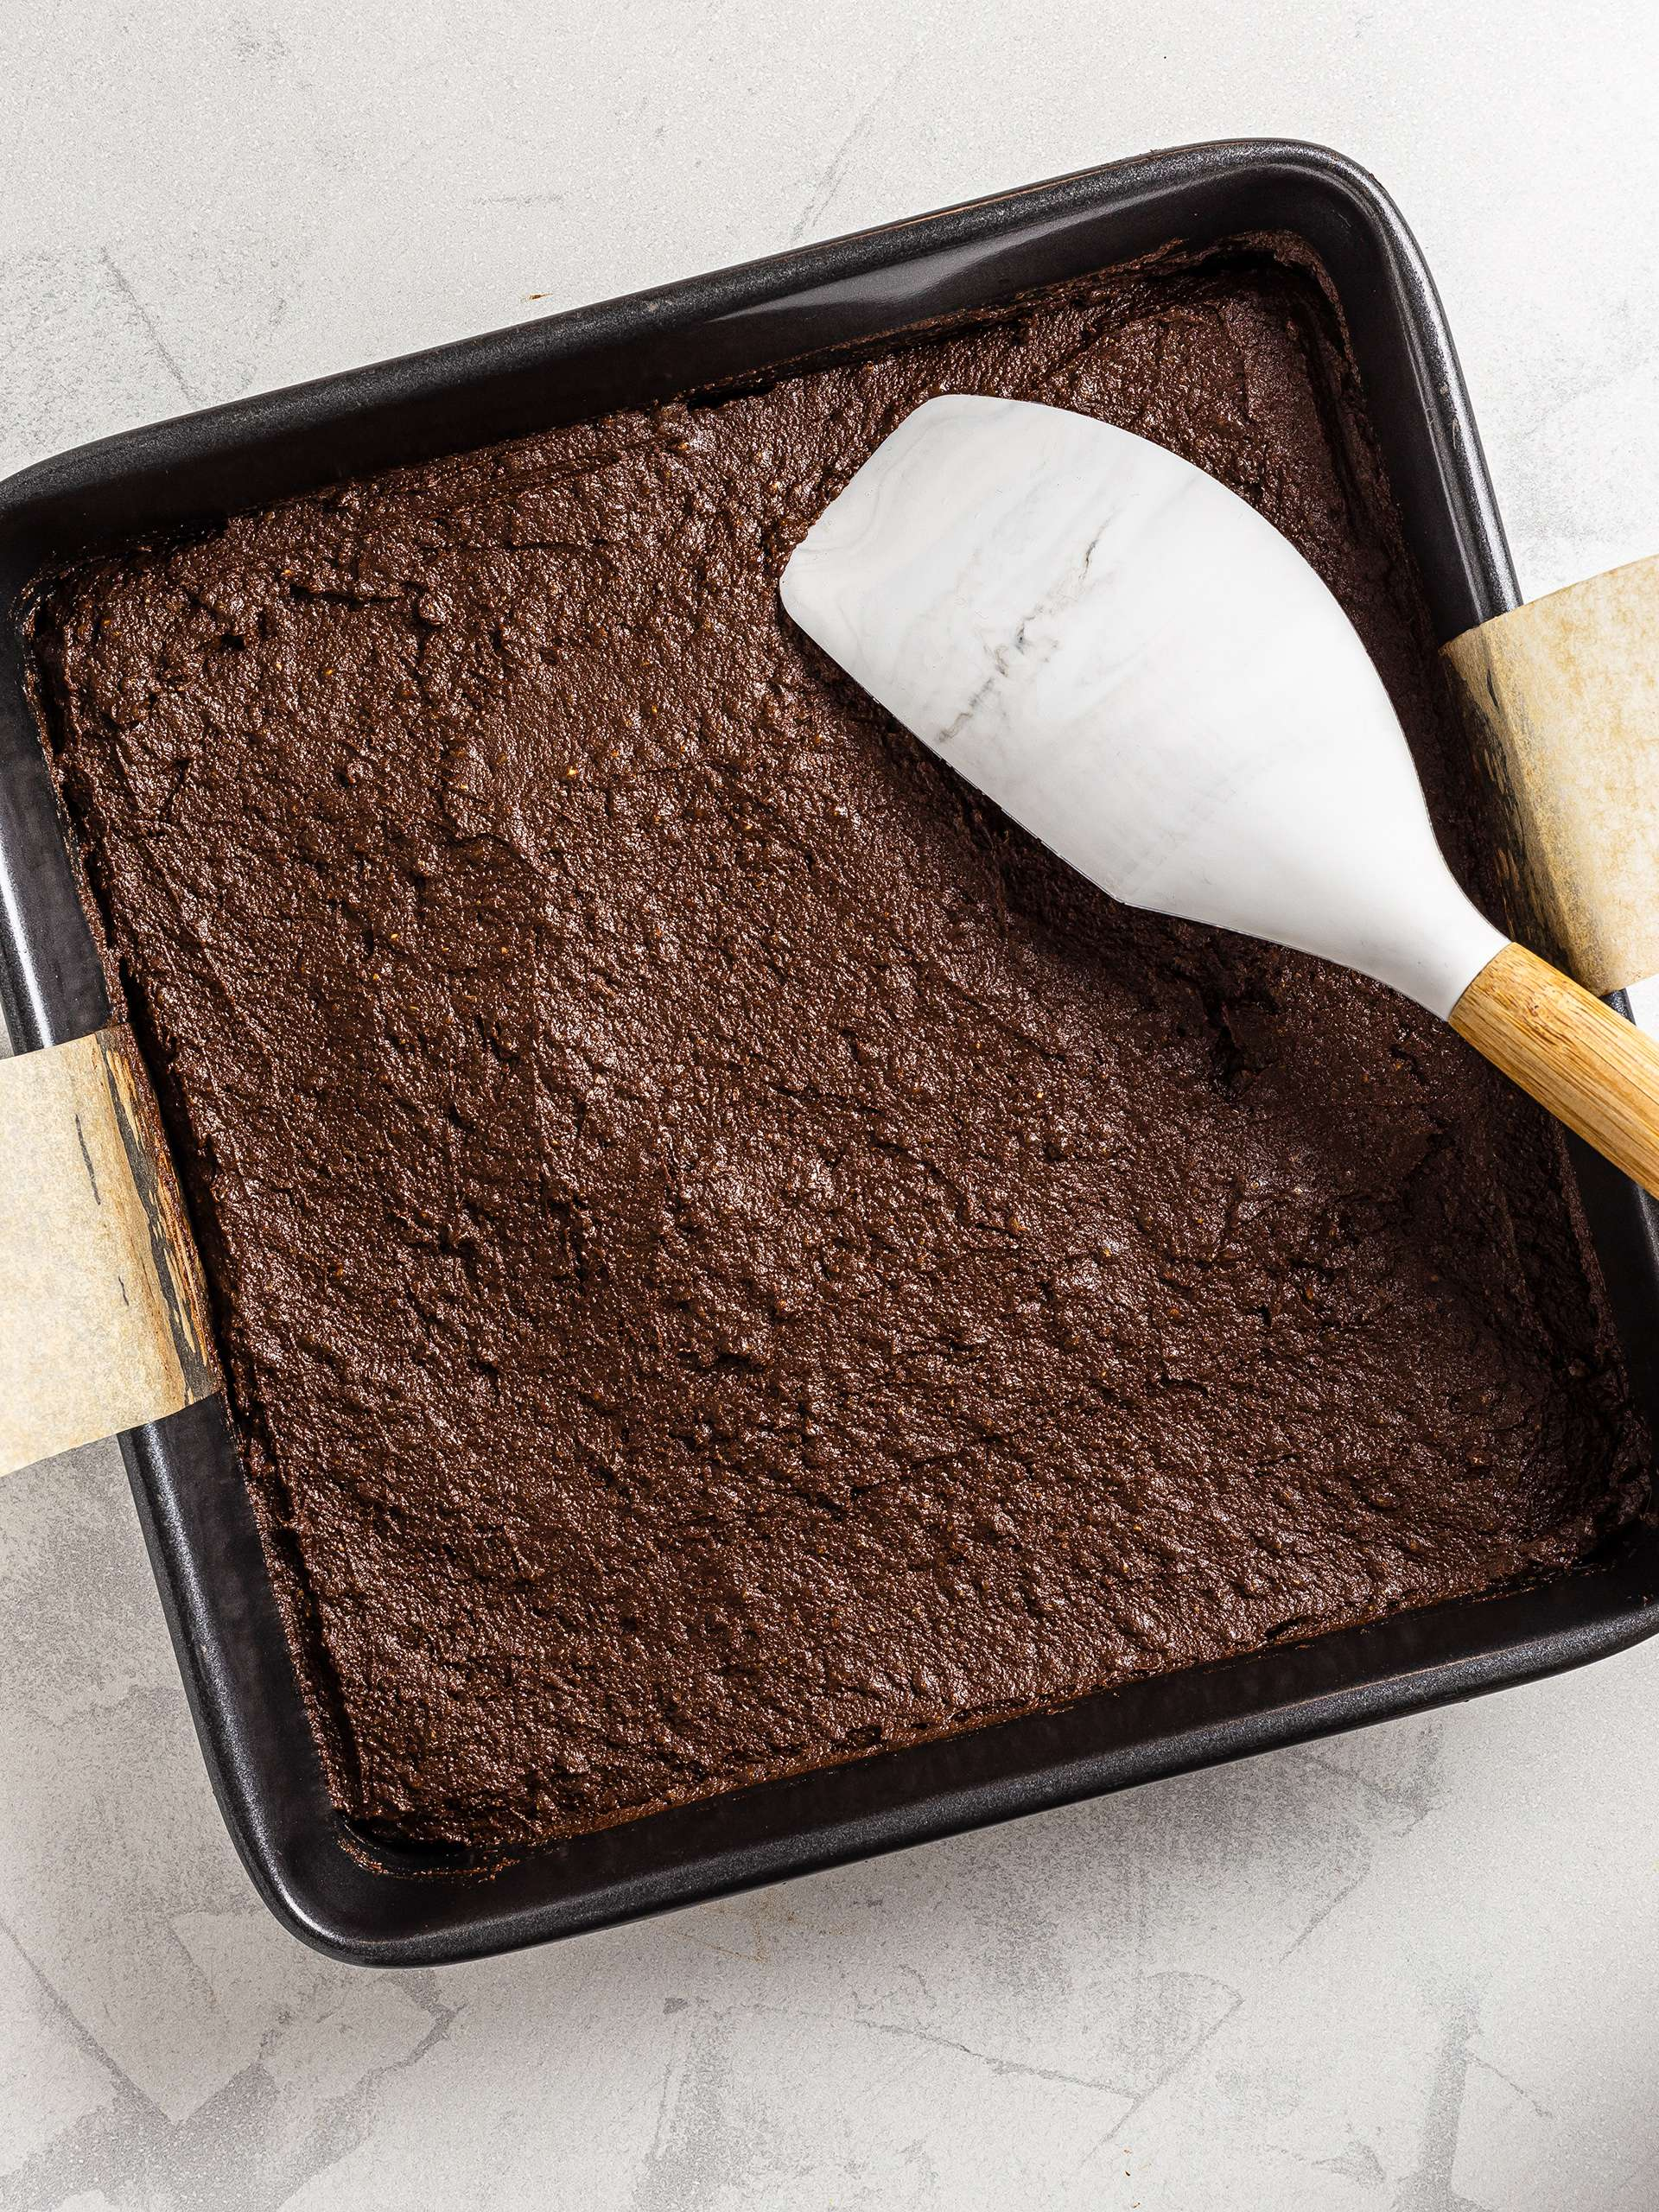 Brownie dough in baking pan